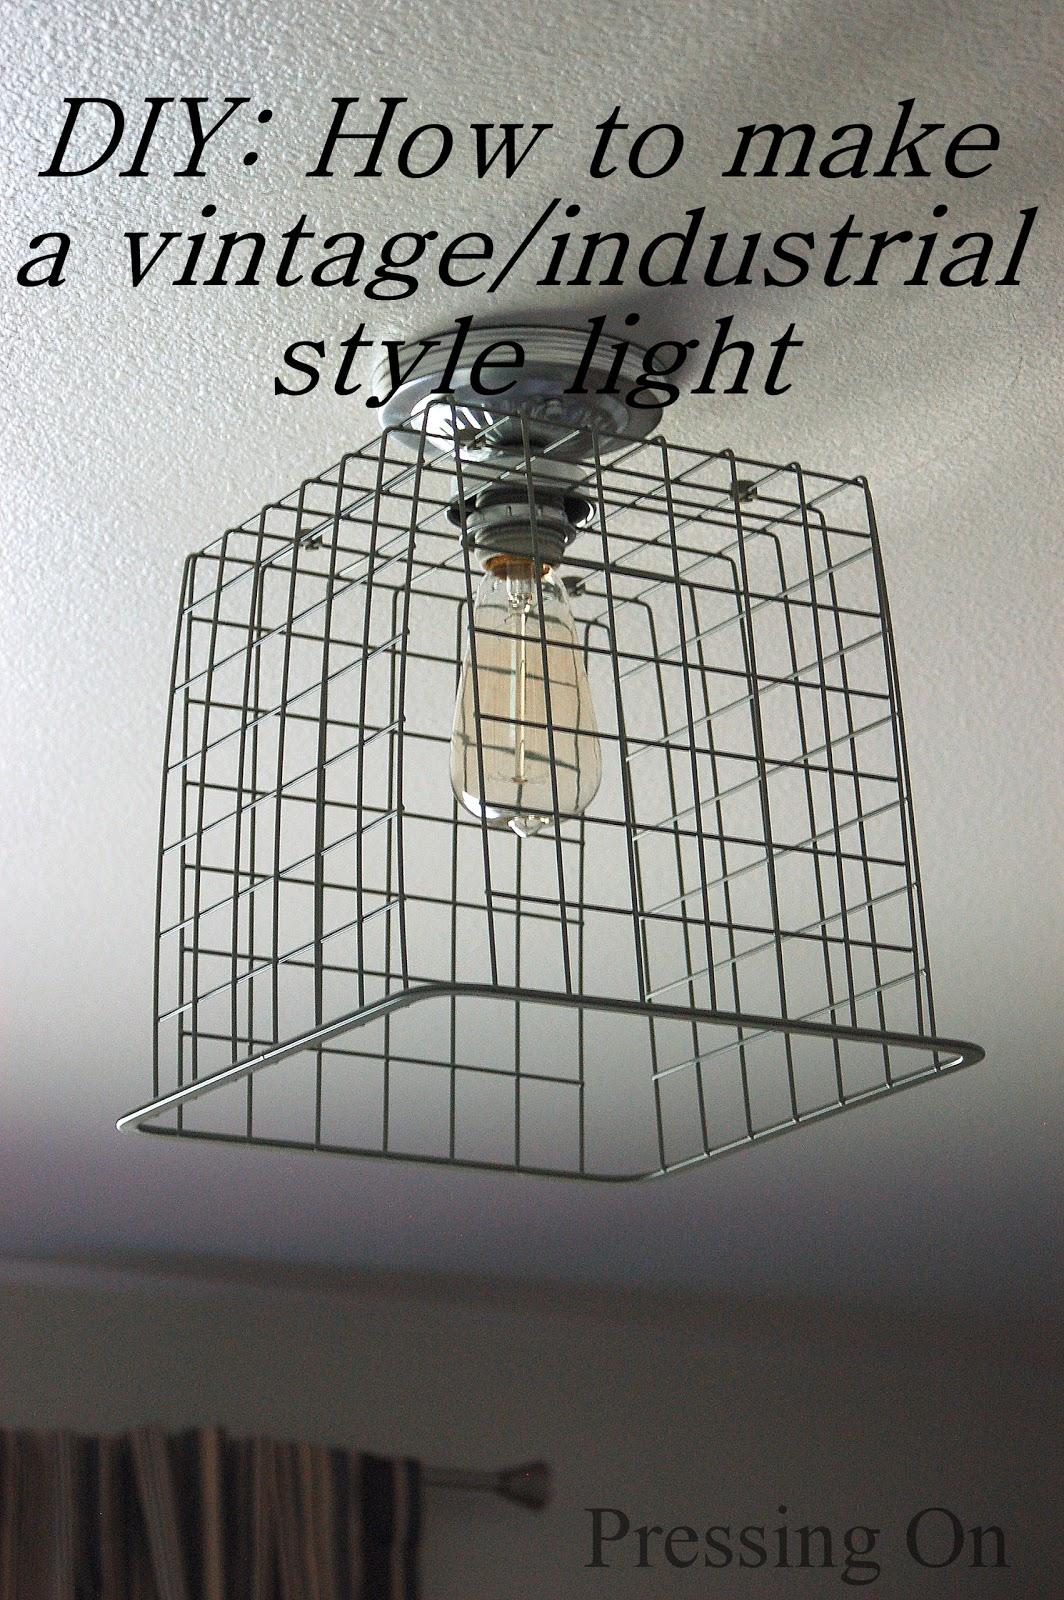 Pressing On Diy Vintage Industrial Style Ceiling Light